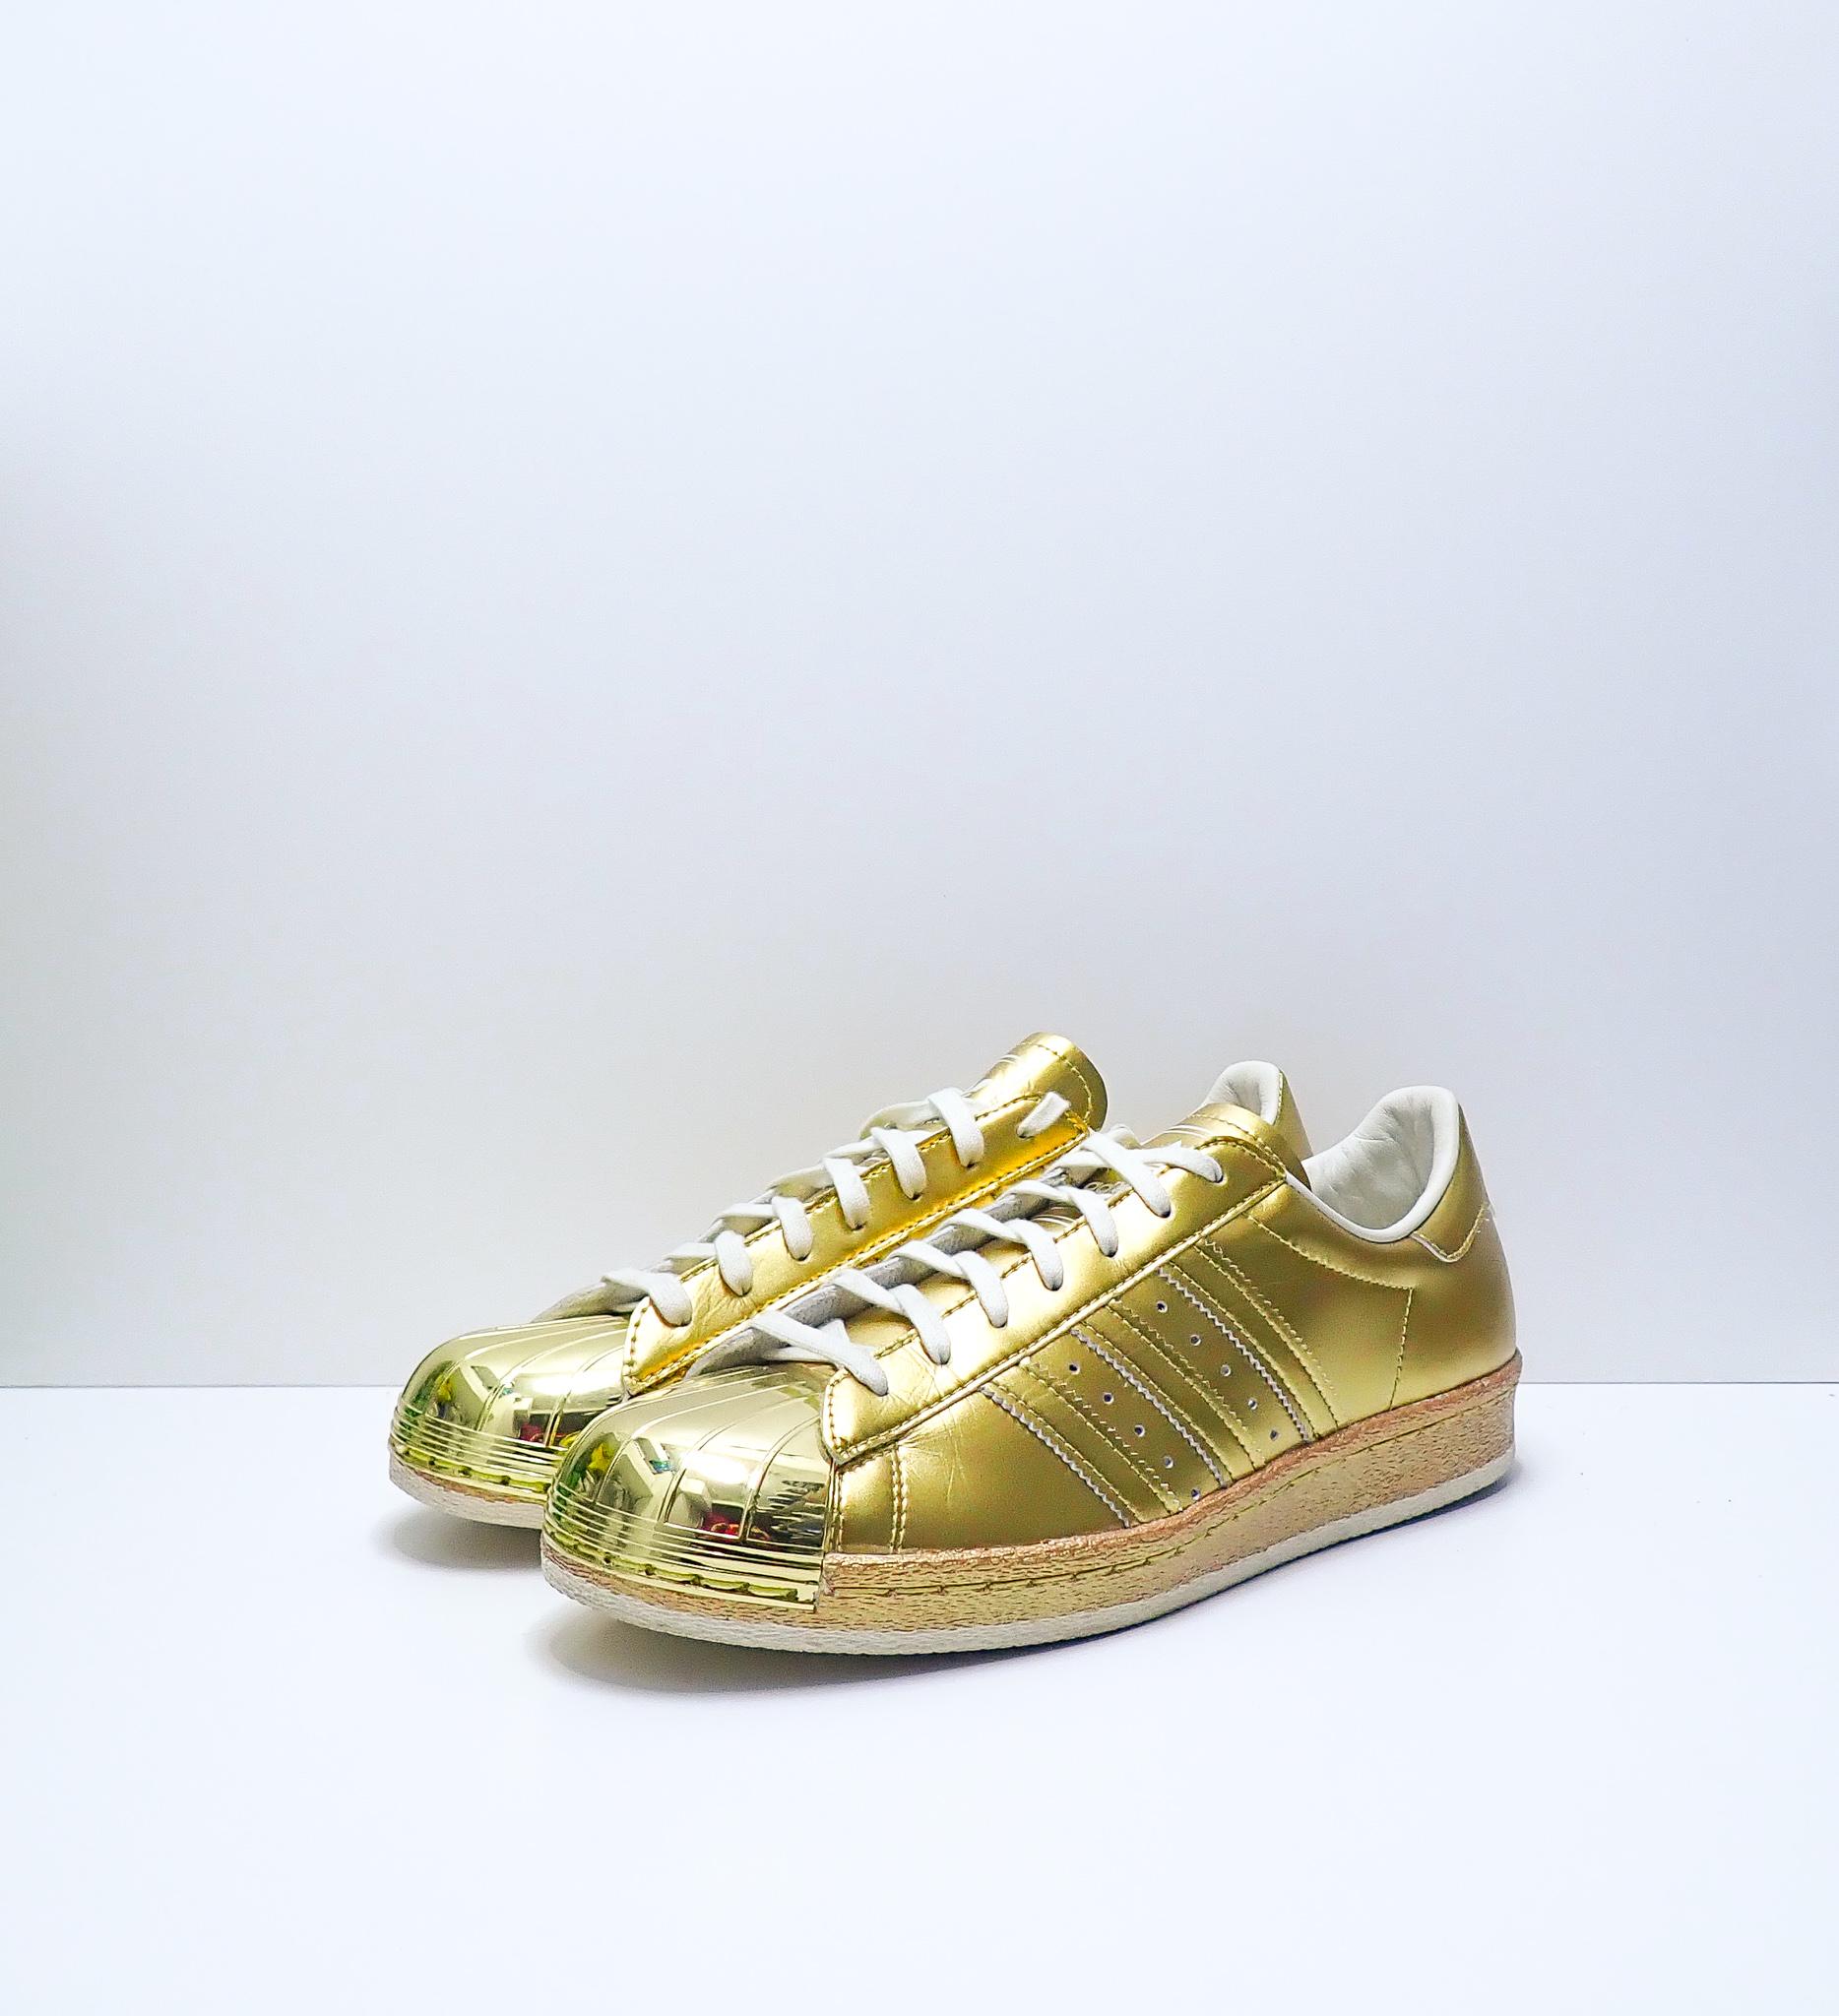 Adidas Superstar 80s Gold